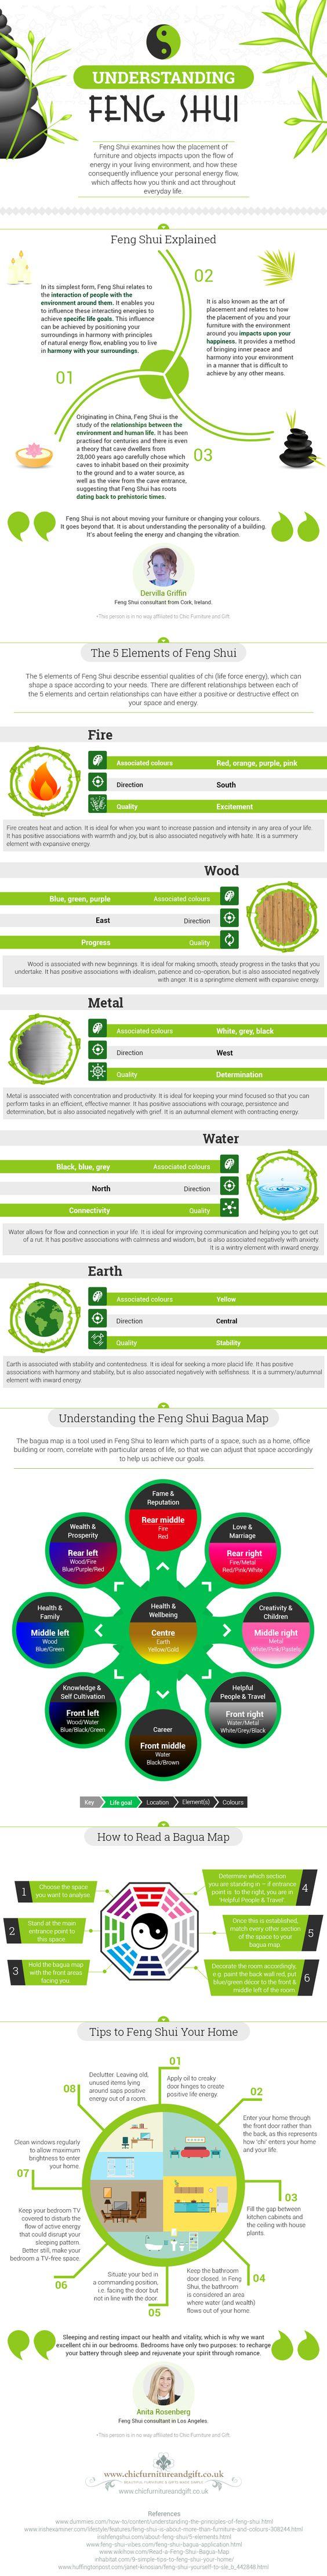 Water Feng Shui Element Infographics Throughout Infographic Feng Shui Elements And Bagua Map Understanding Feng Shui Elements Bagua Map Epic Home Ideas